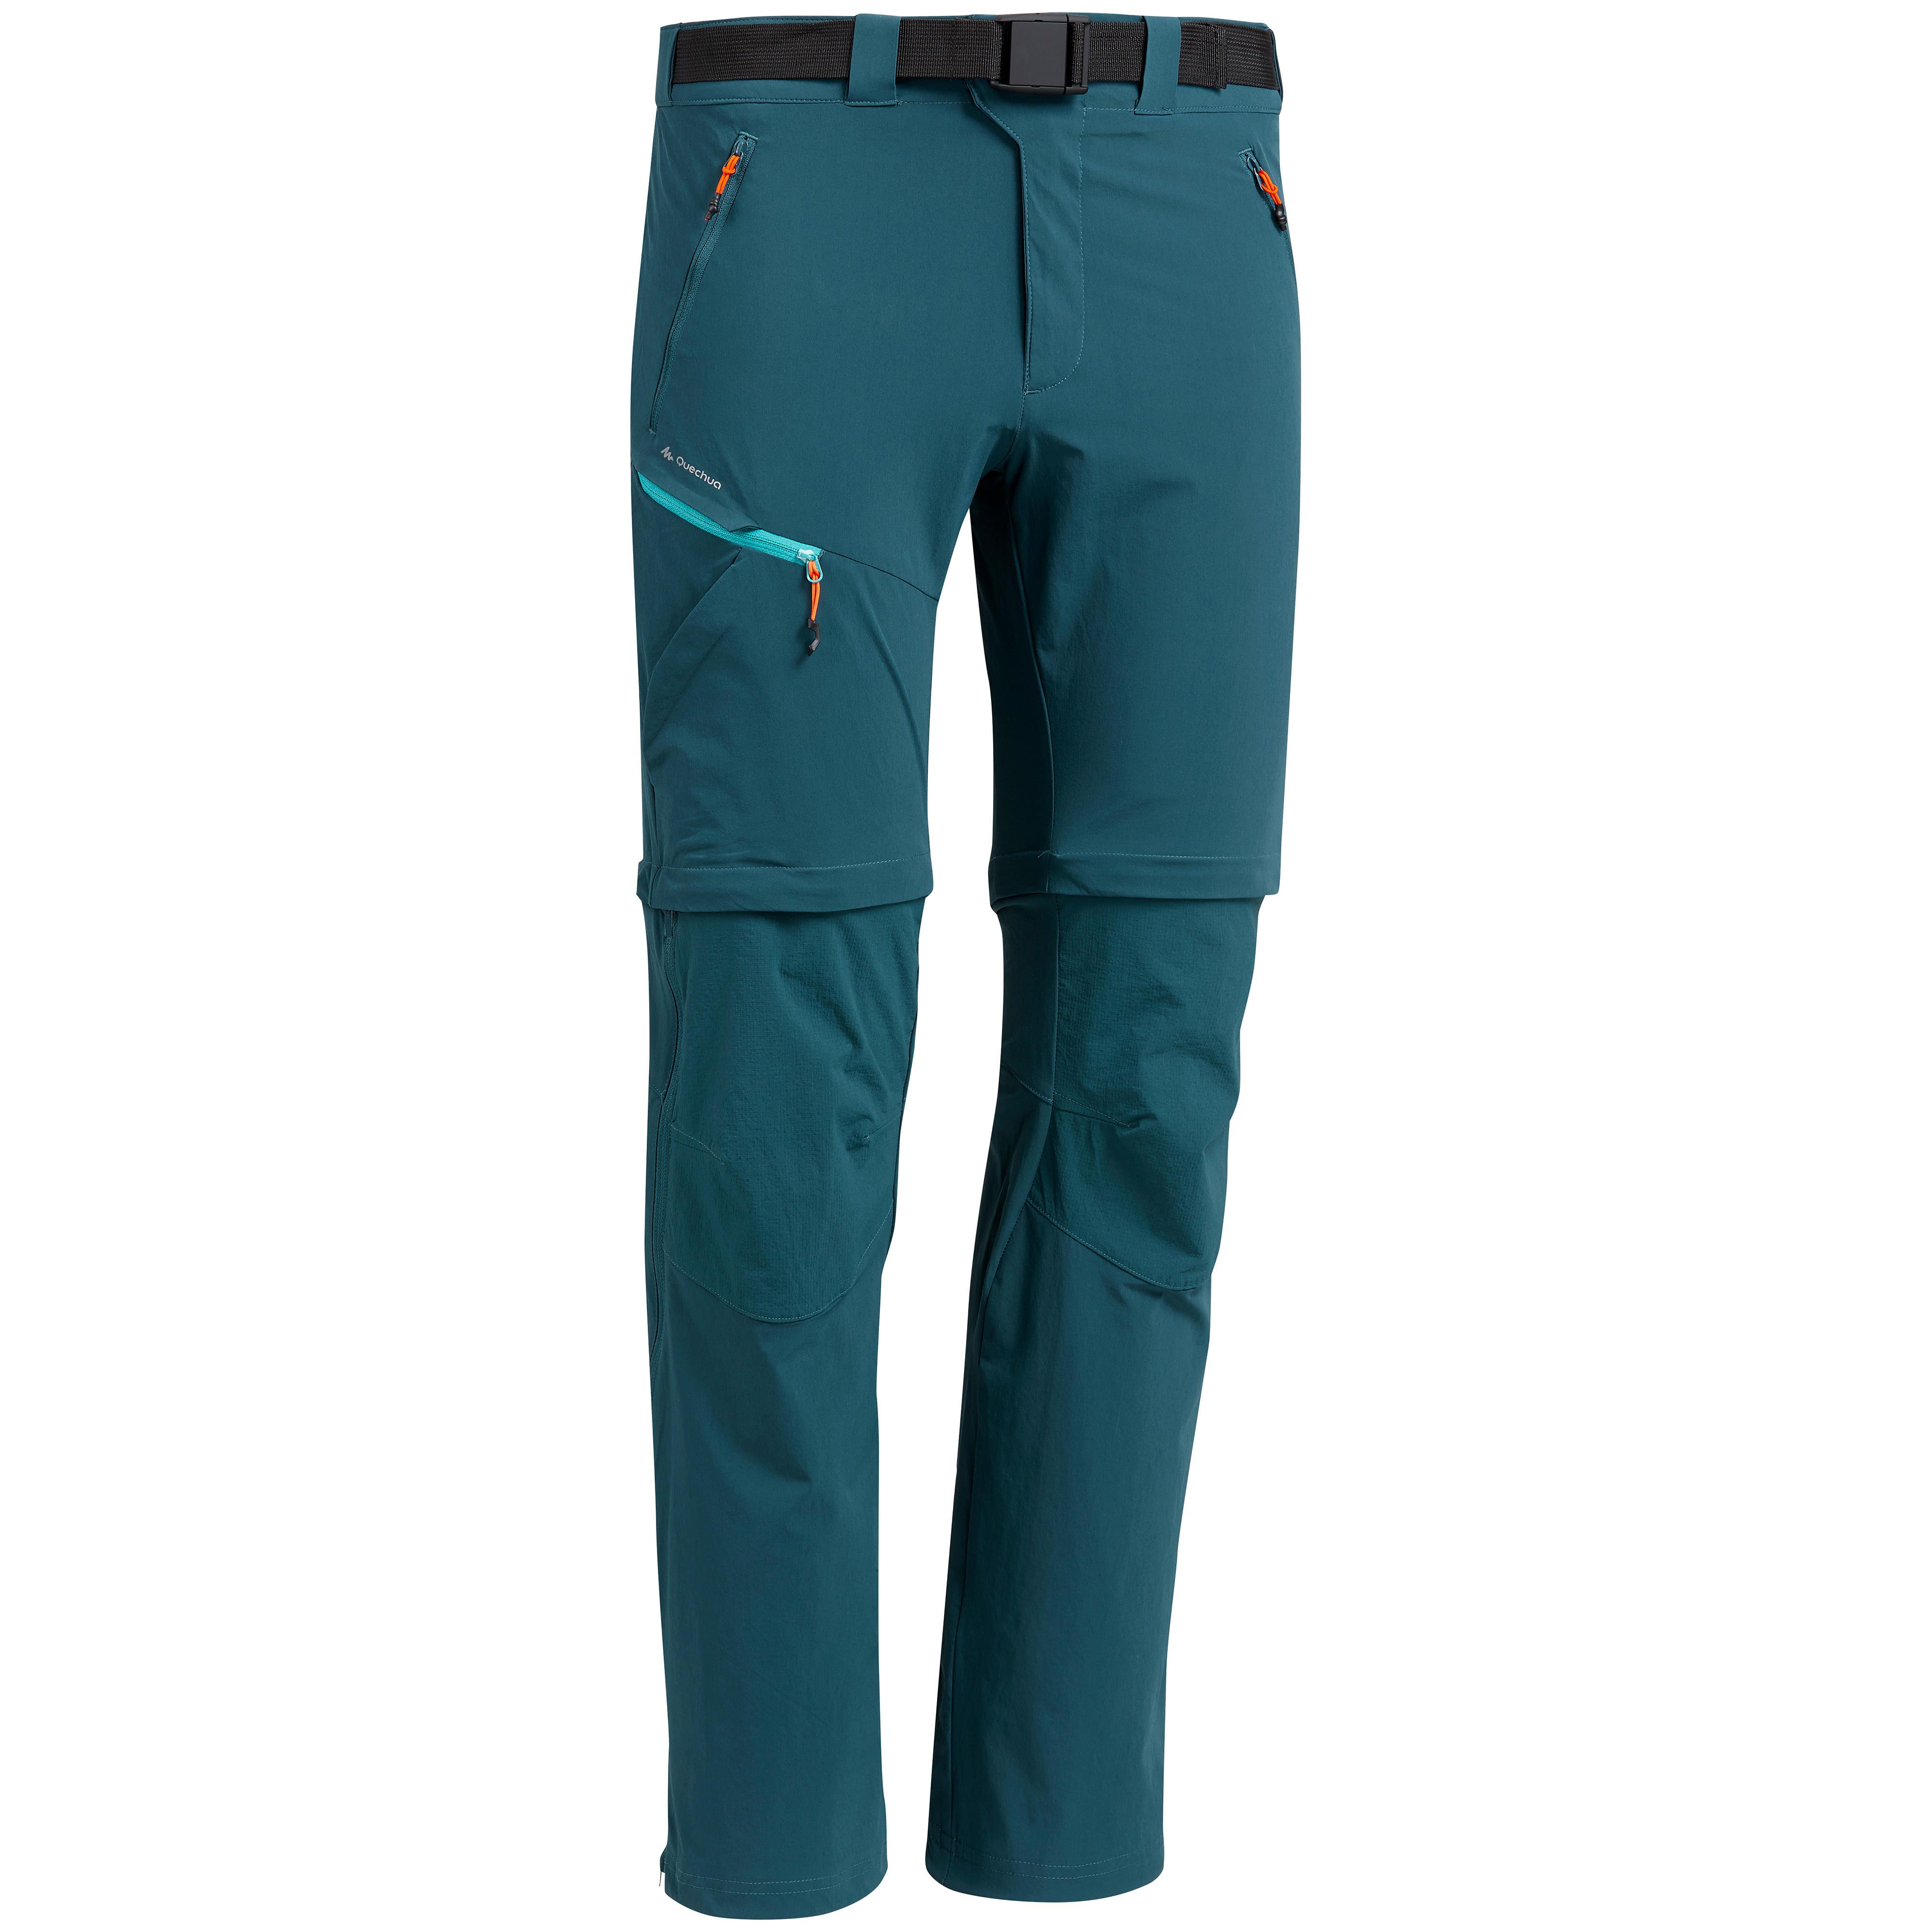 Herren Zip-Off-Wanderhose MH550 Herren blau | 03608439449192